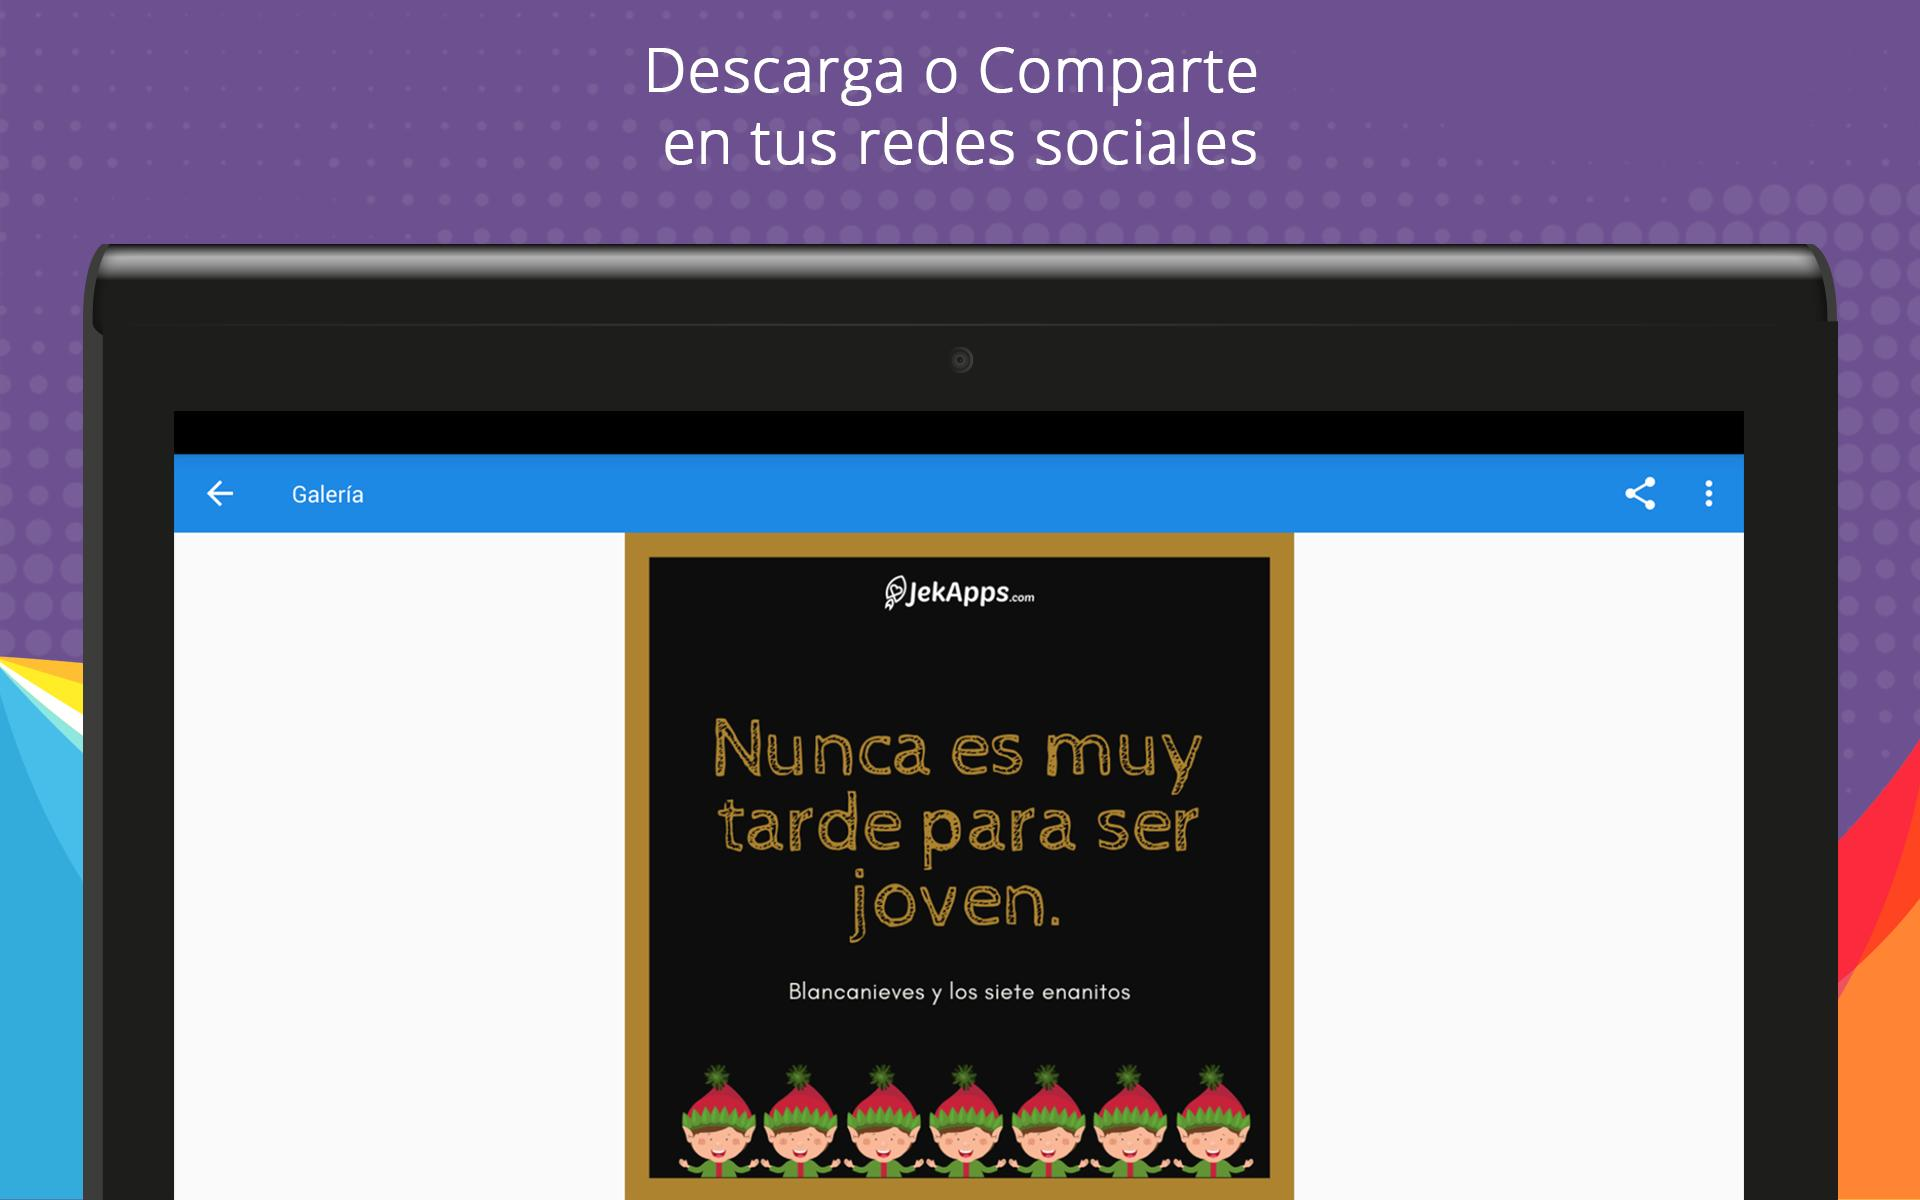 Frases De Peliculas Animadas For Android Apk Download